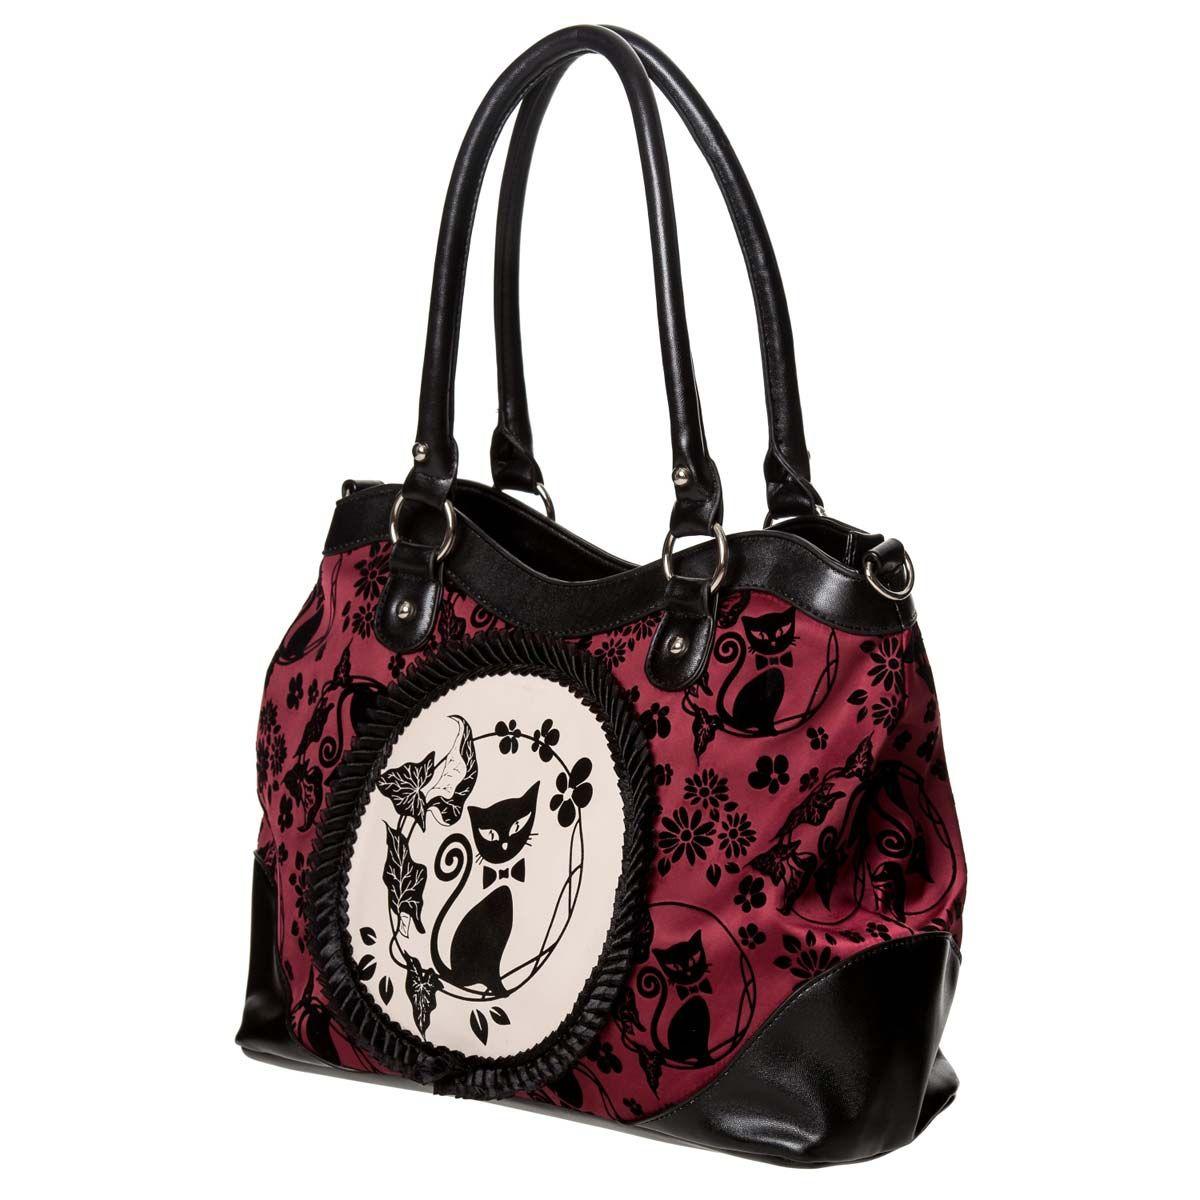 c1feb0b1766c9 Gothic Lolita Handtasche bordeaux-schwarz - Cameo Cat